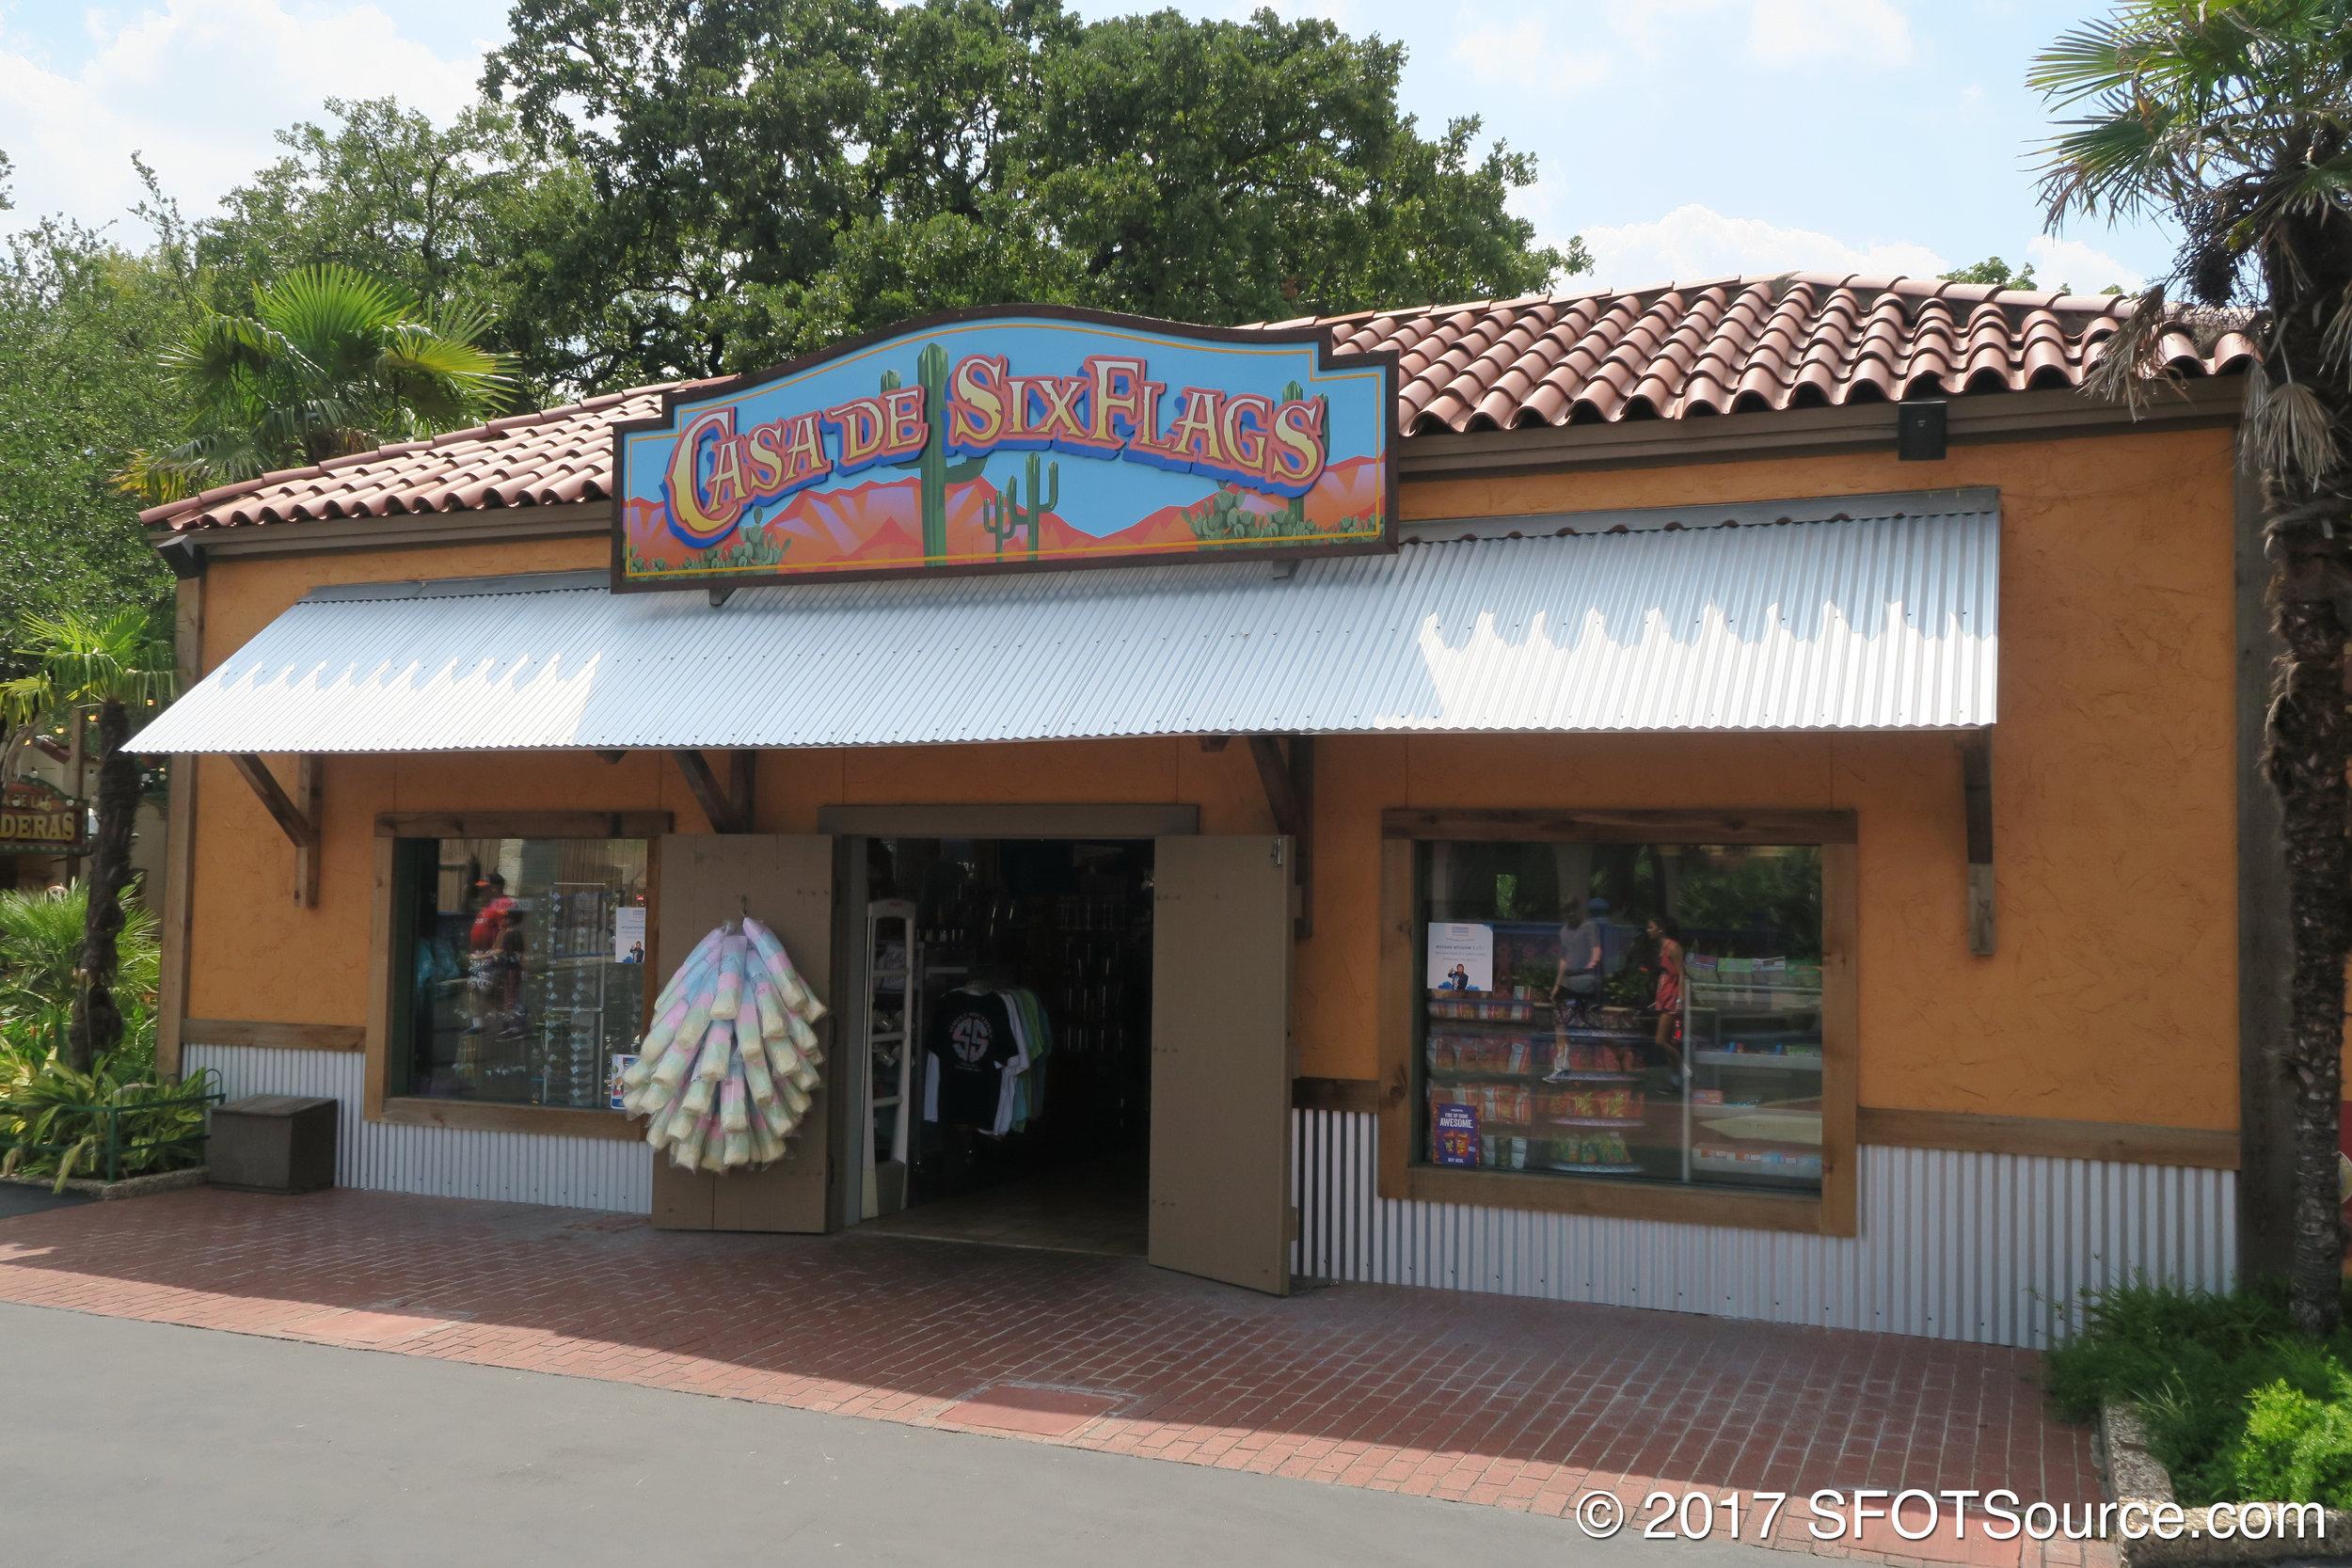 The main entrance to Casa de Six Flags.